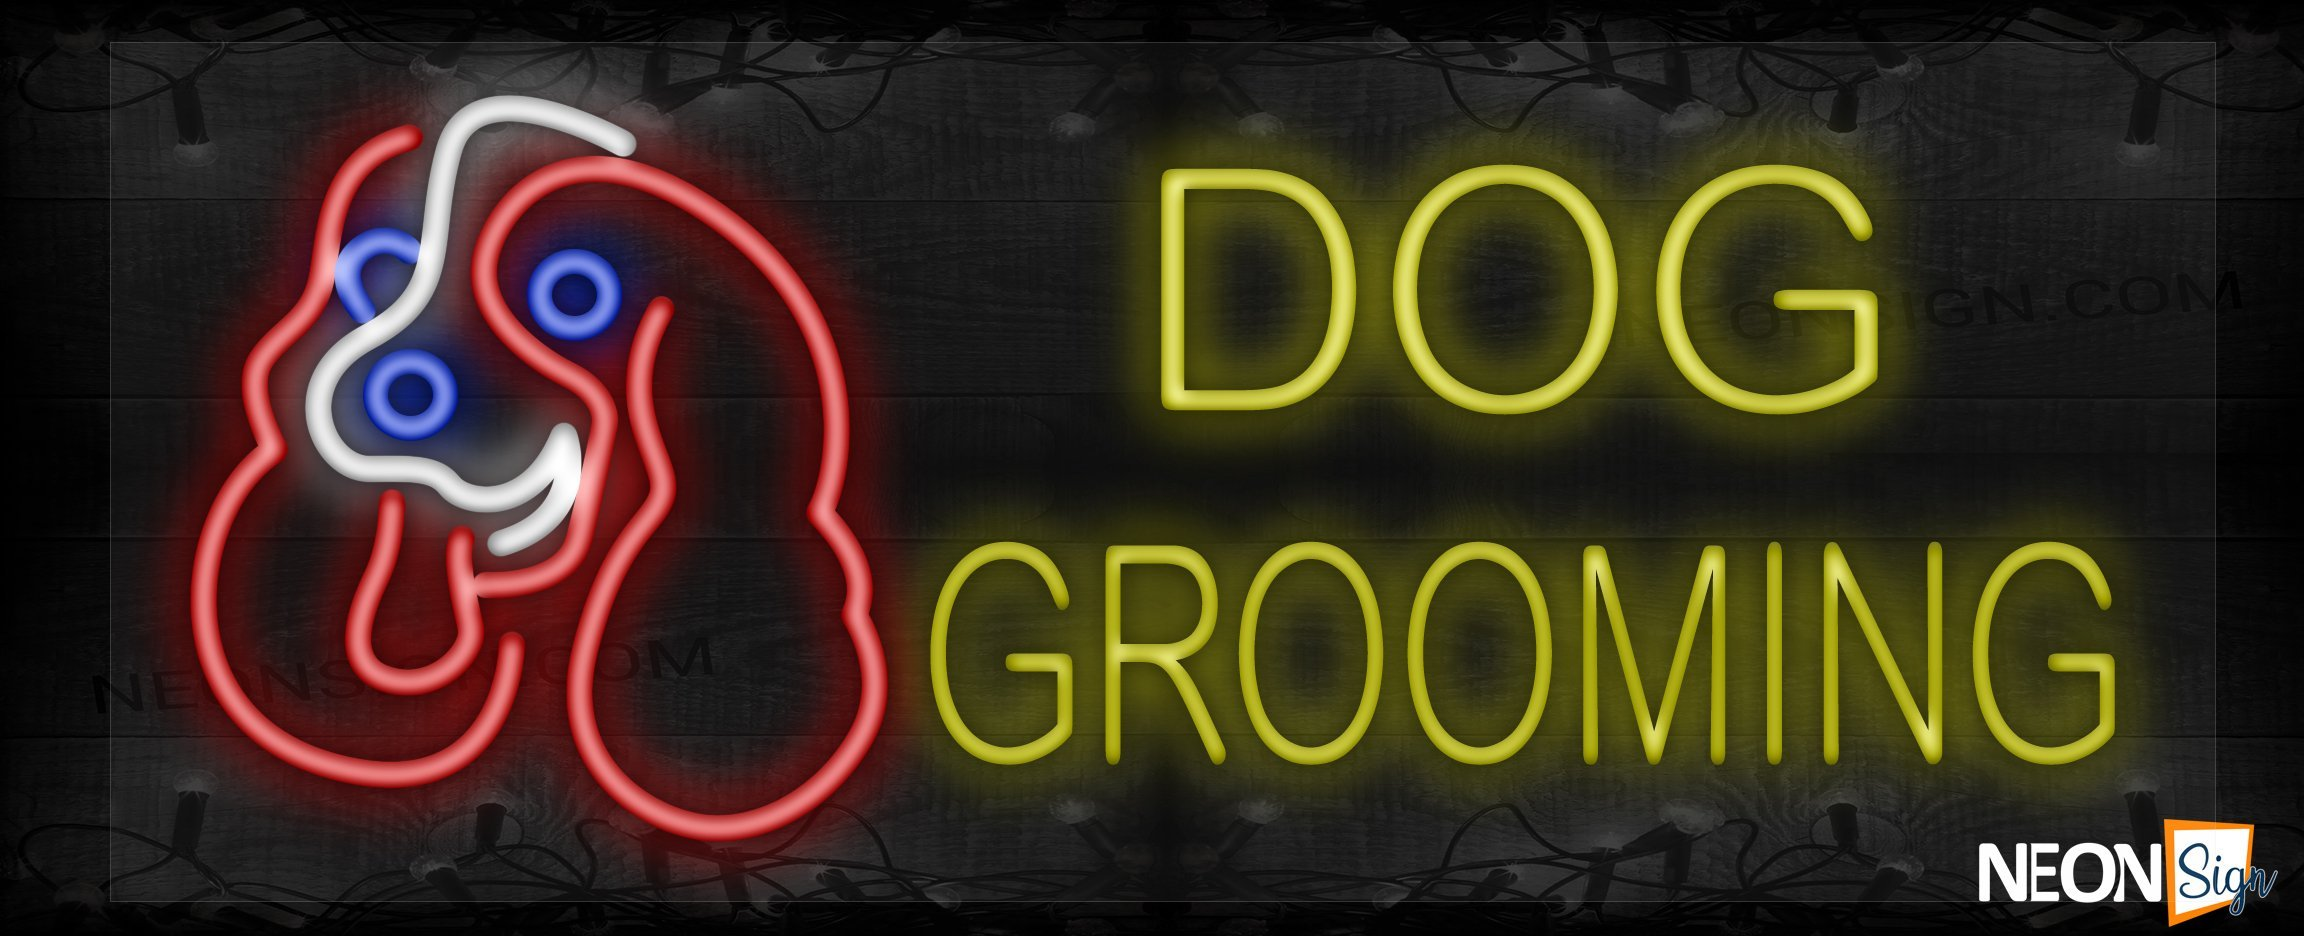 Image of Dog Grooming with logo LED Flex